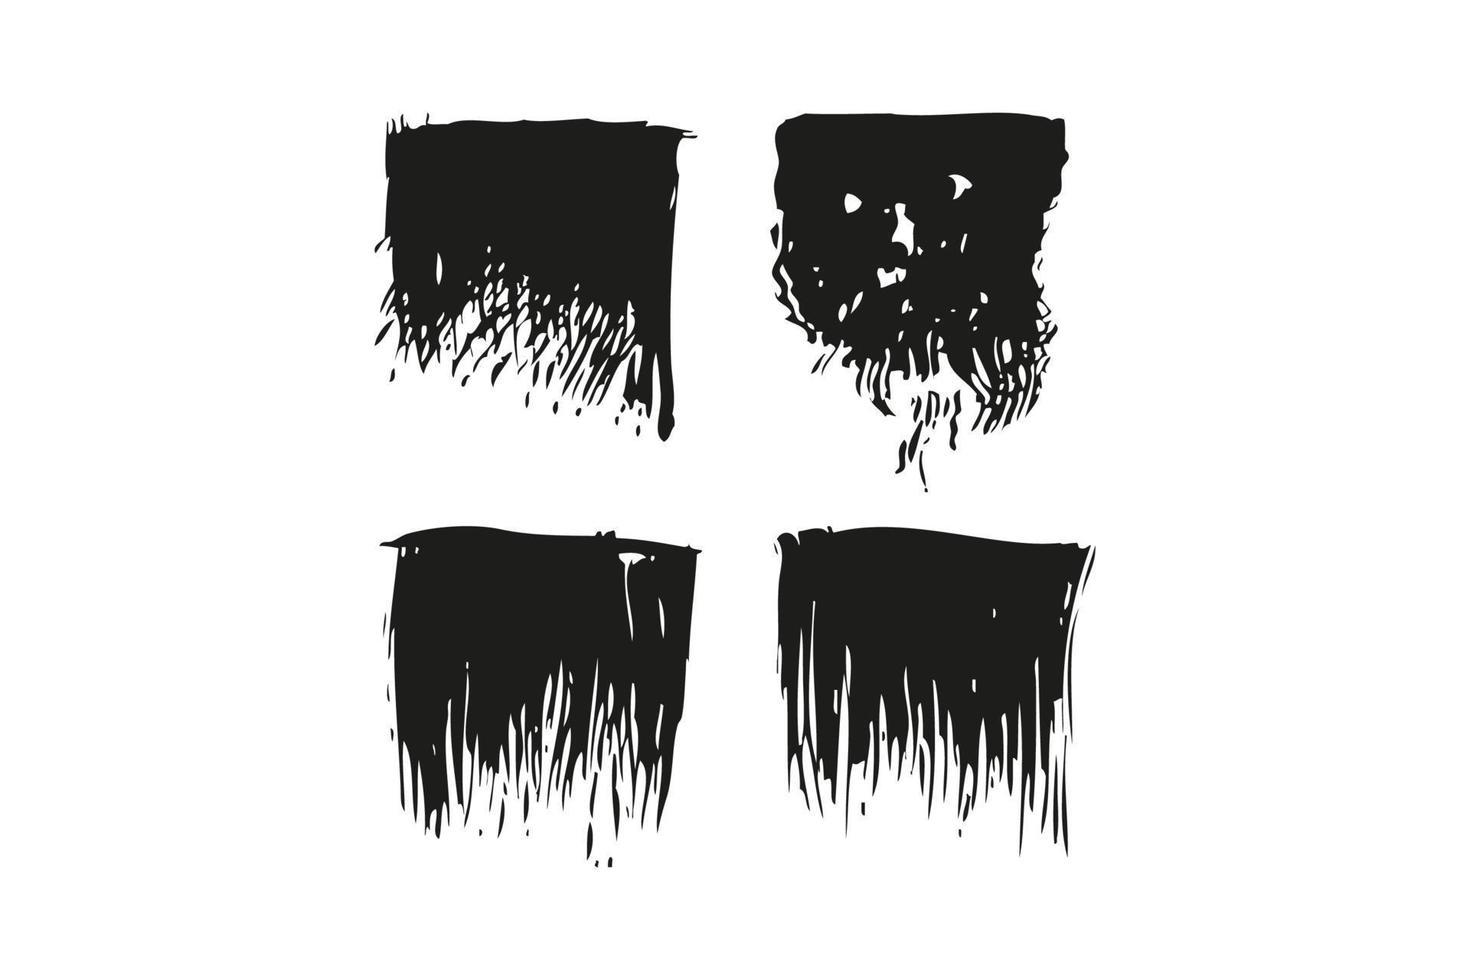 grunge brush vector